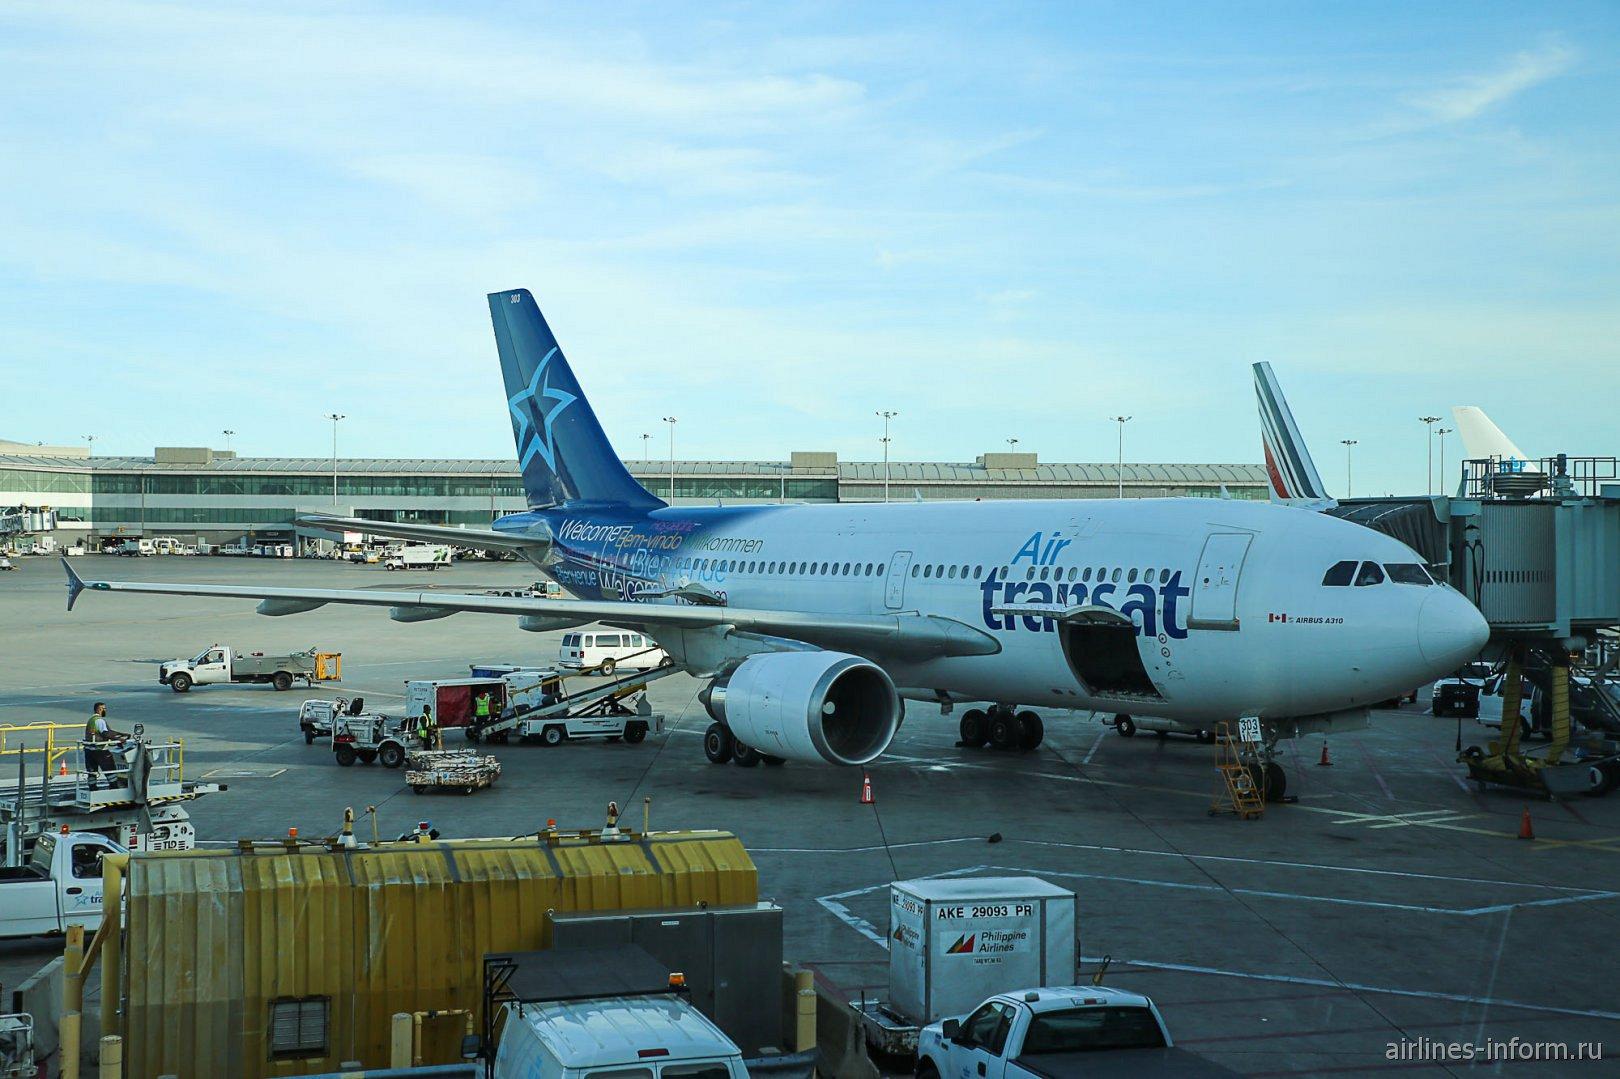 Airbus A310 авиакомпании Air Transat в аэропорту Торонто Пирсон